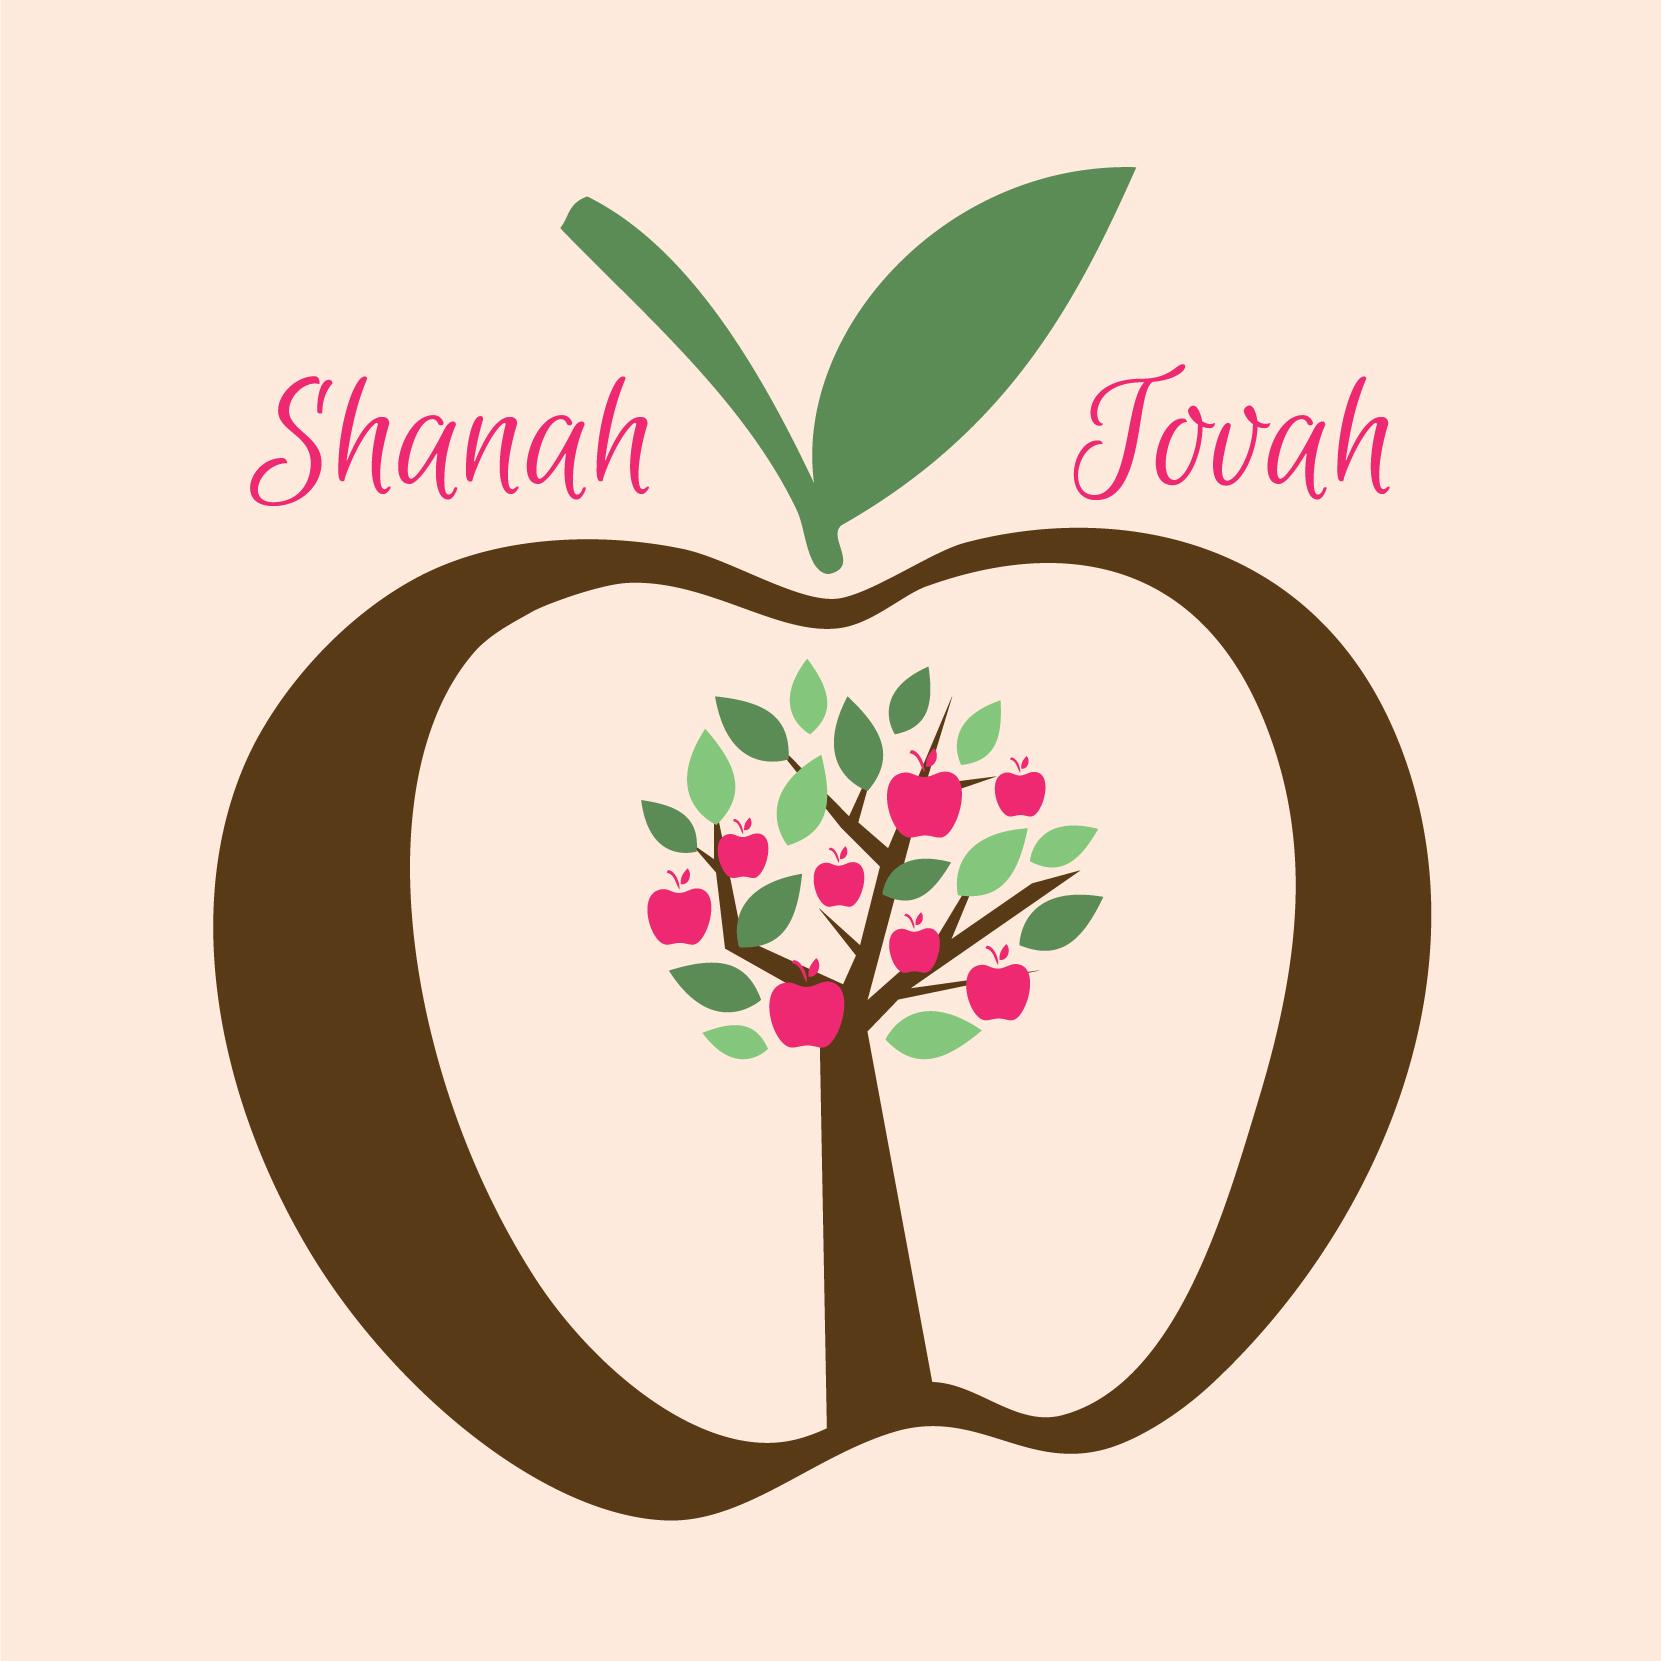 Rosh Hashanah greeting card by Ananya